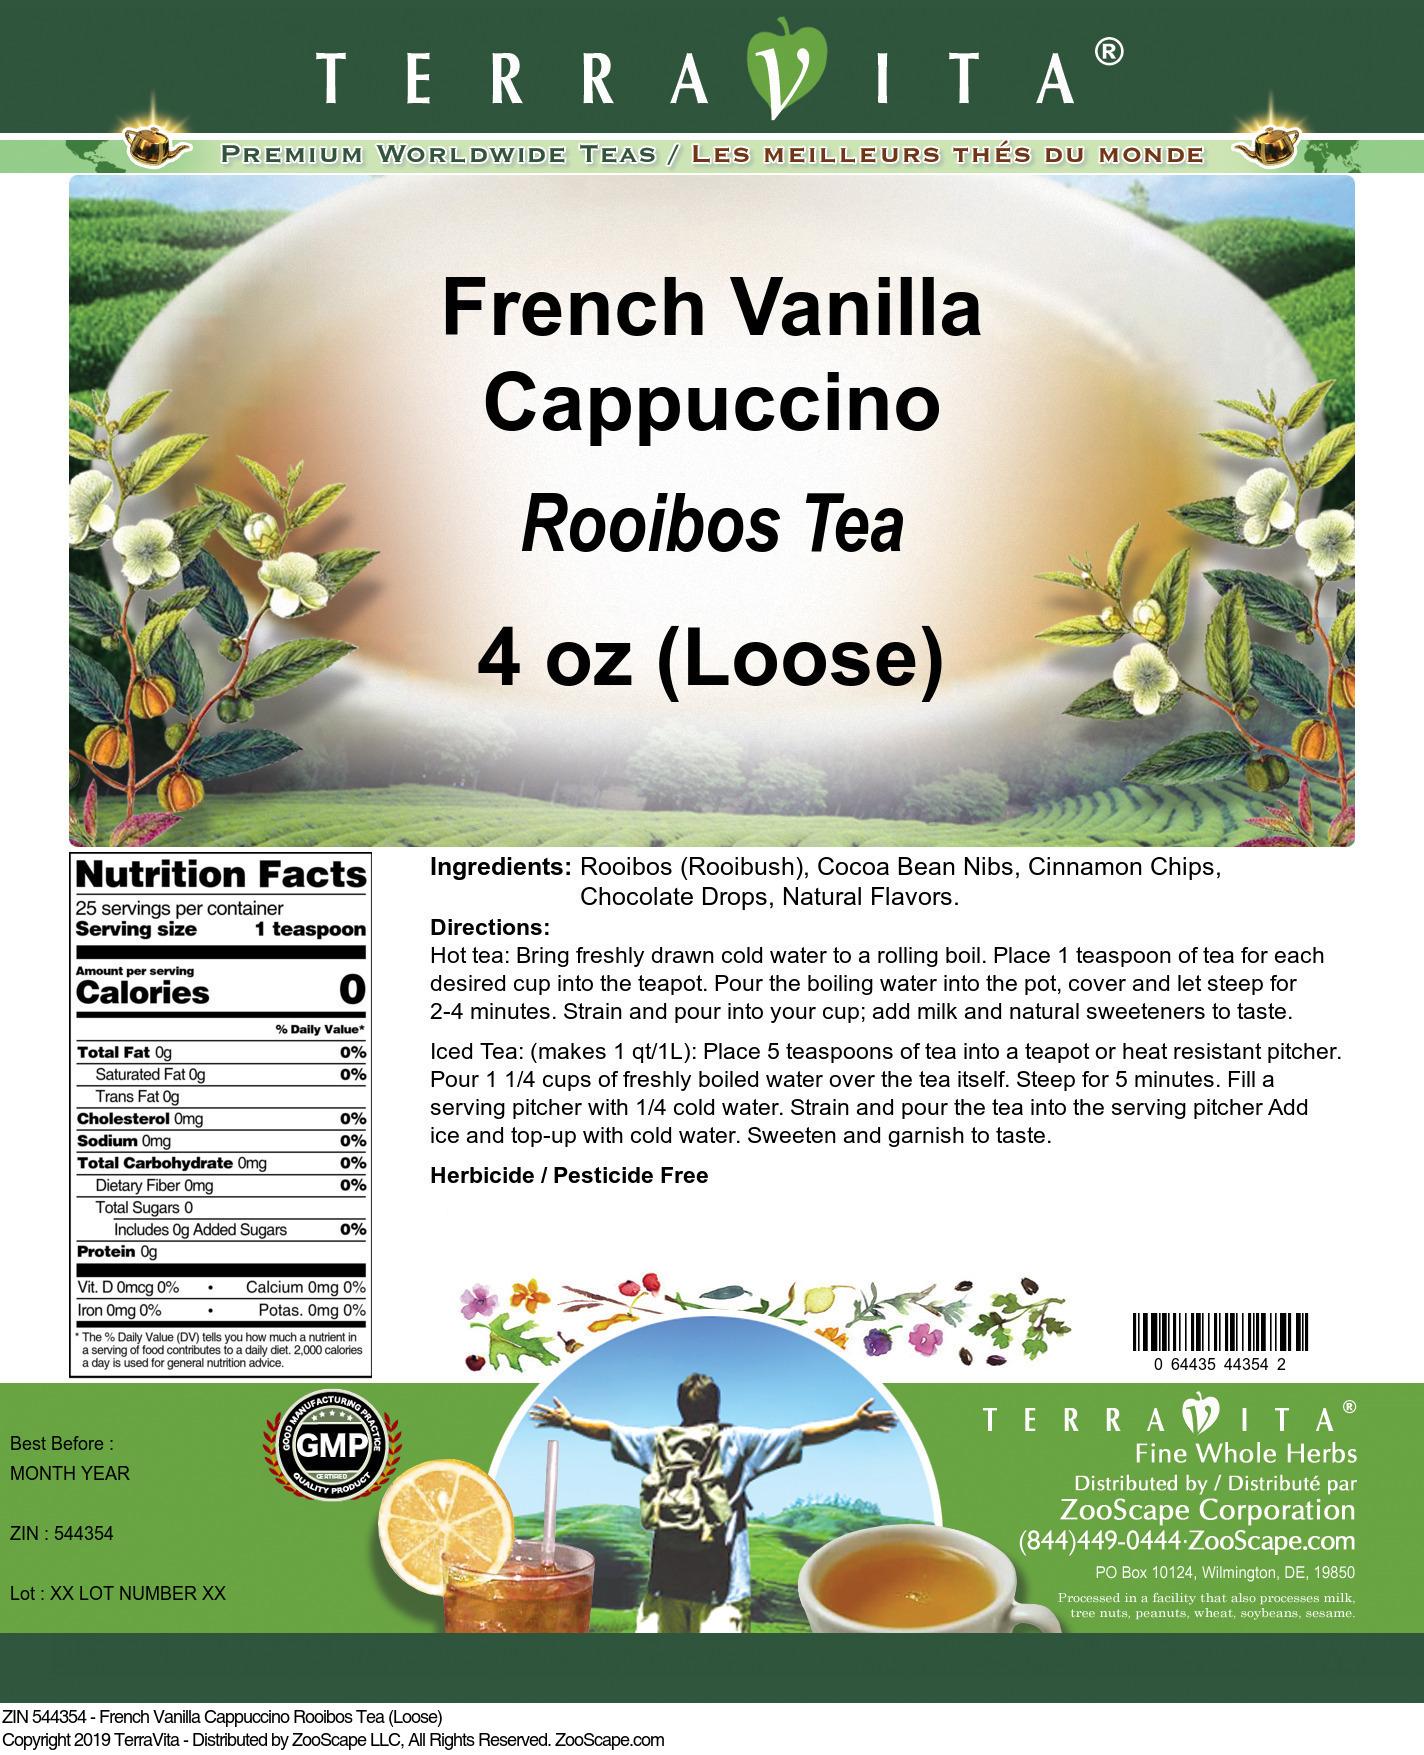 French Vanilla Cappuccino Rooibos Tea (Loose)